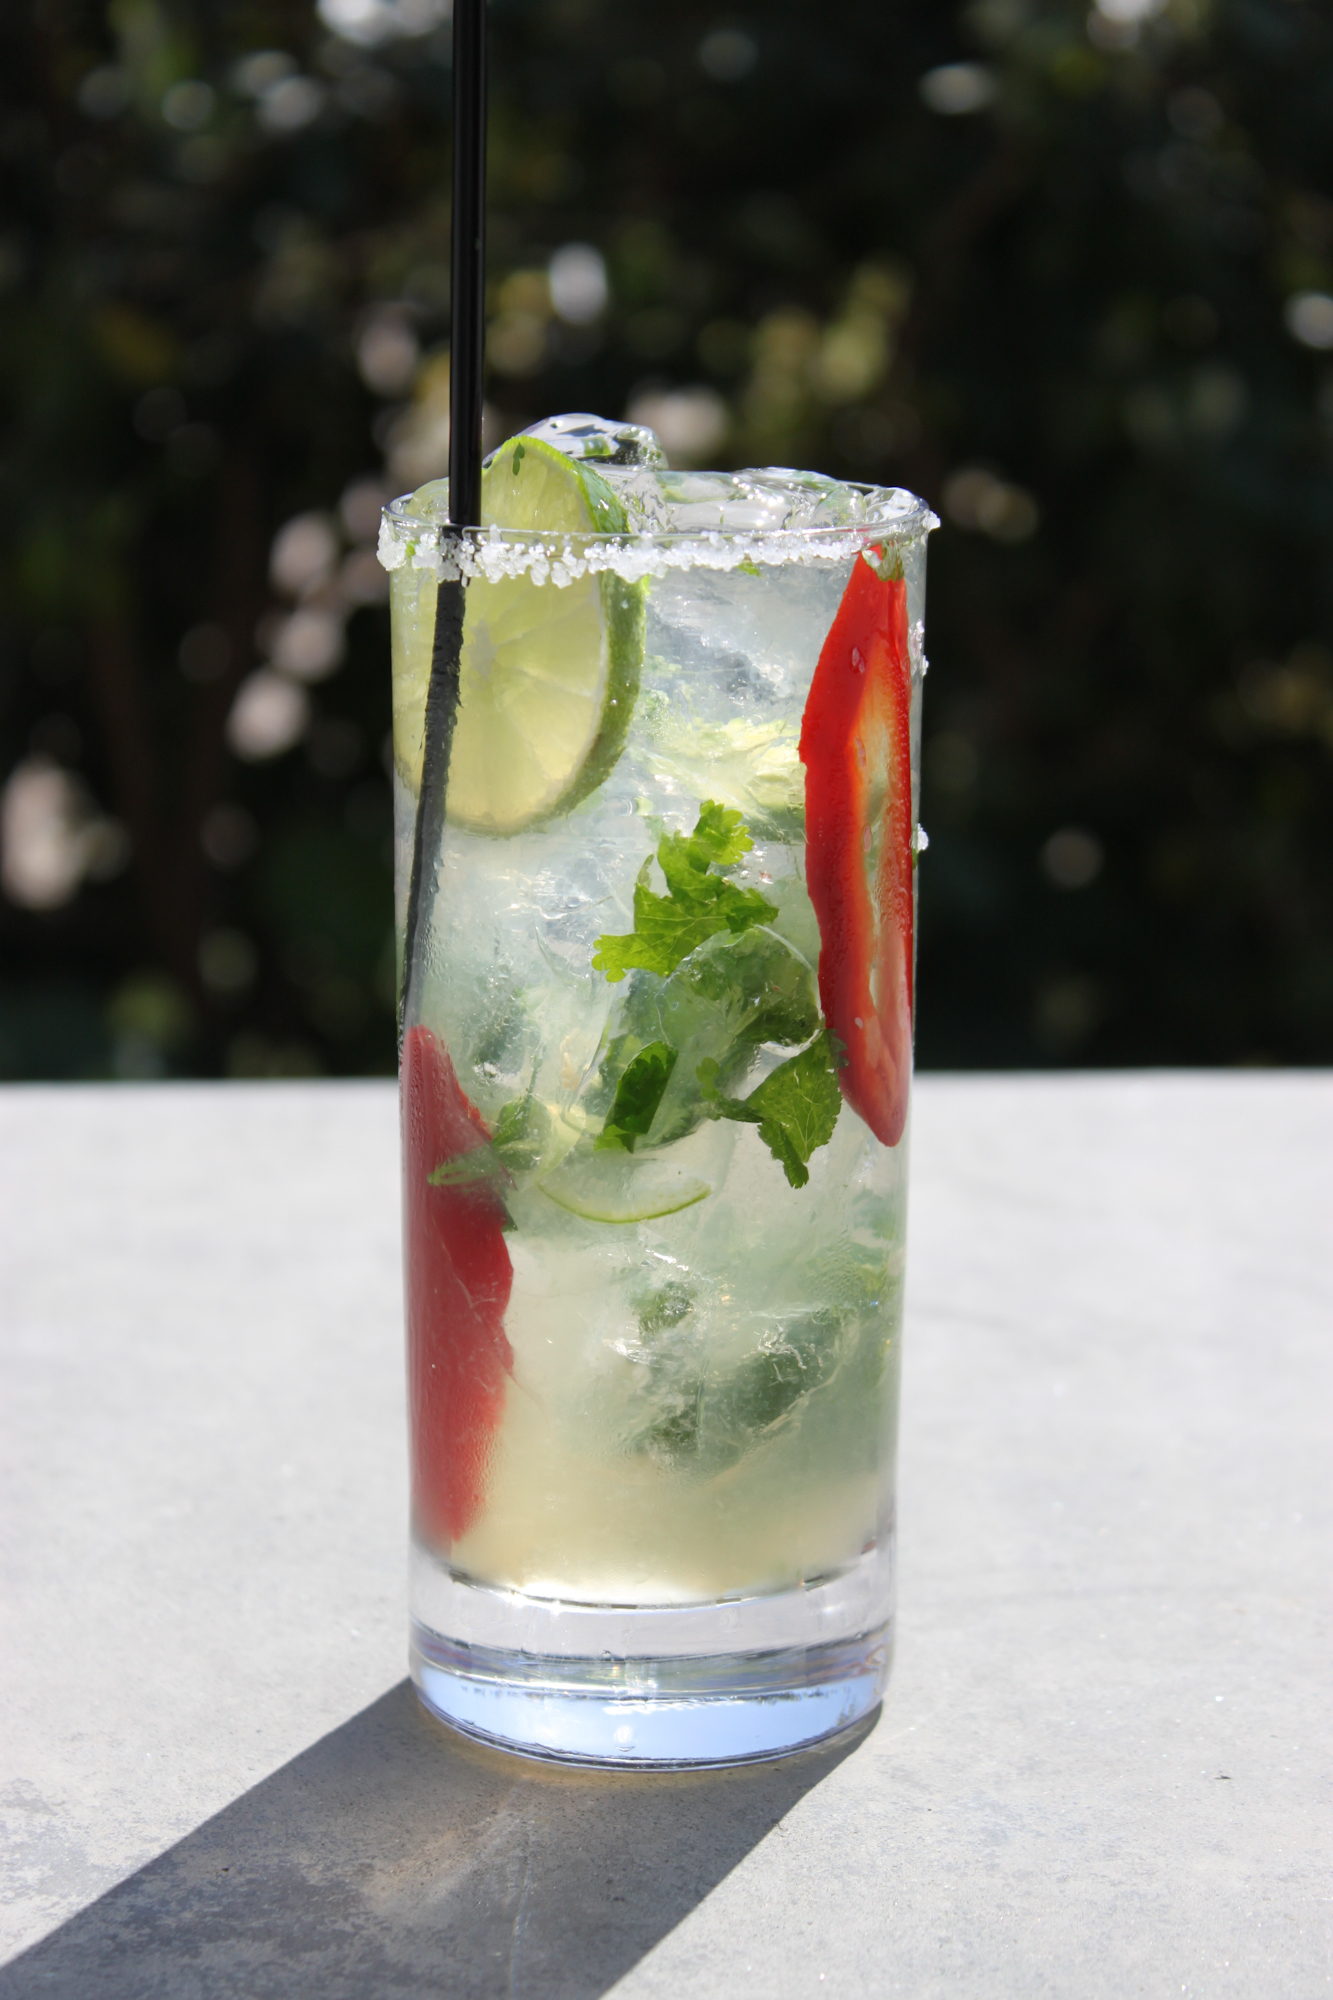 Jalapeno and Cilantro Margarita 4 3